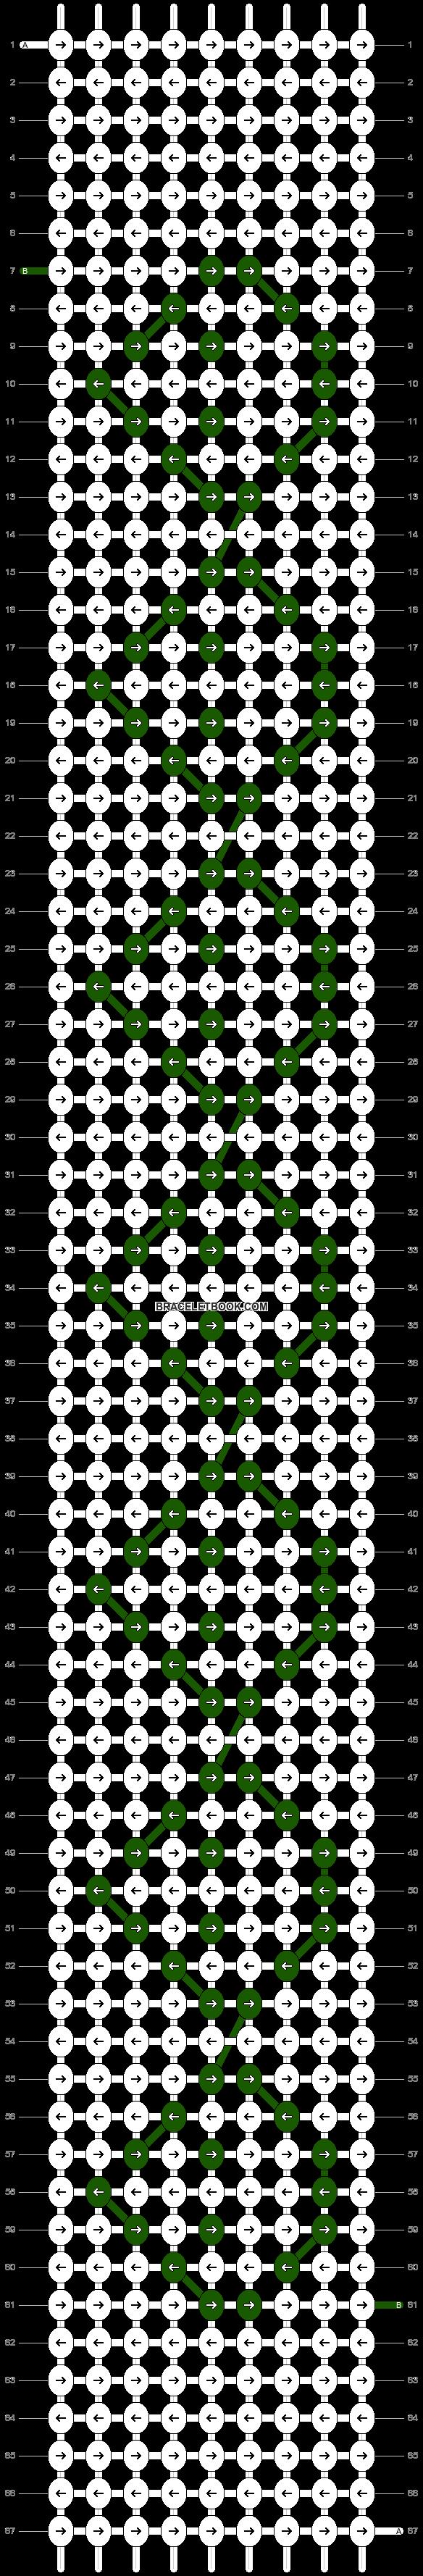 Alpha pattern #11833 pattern